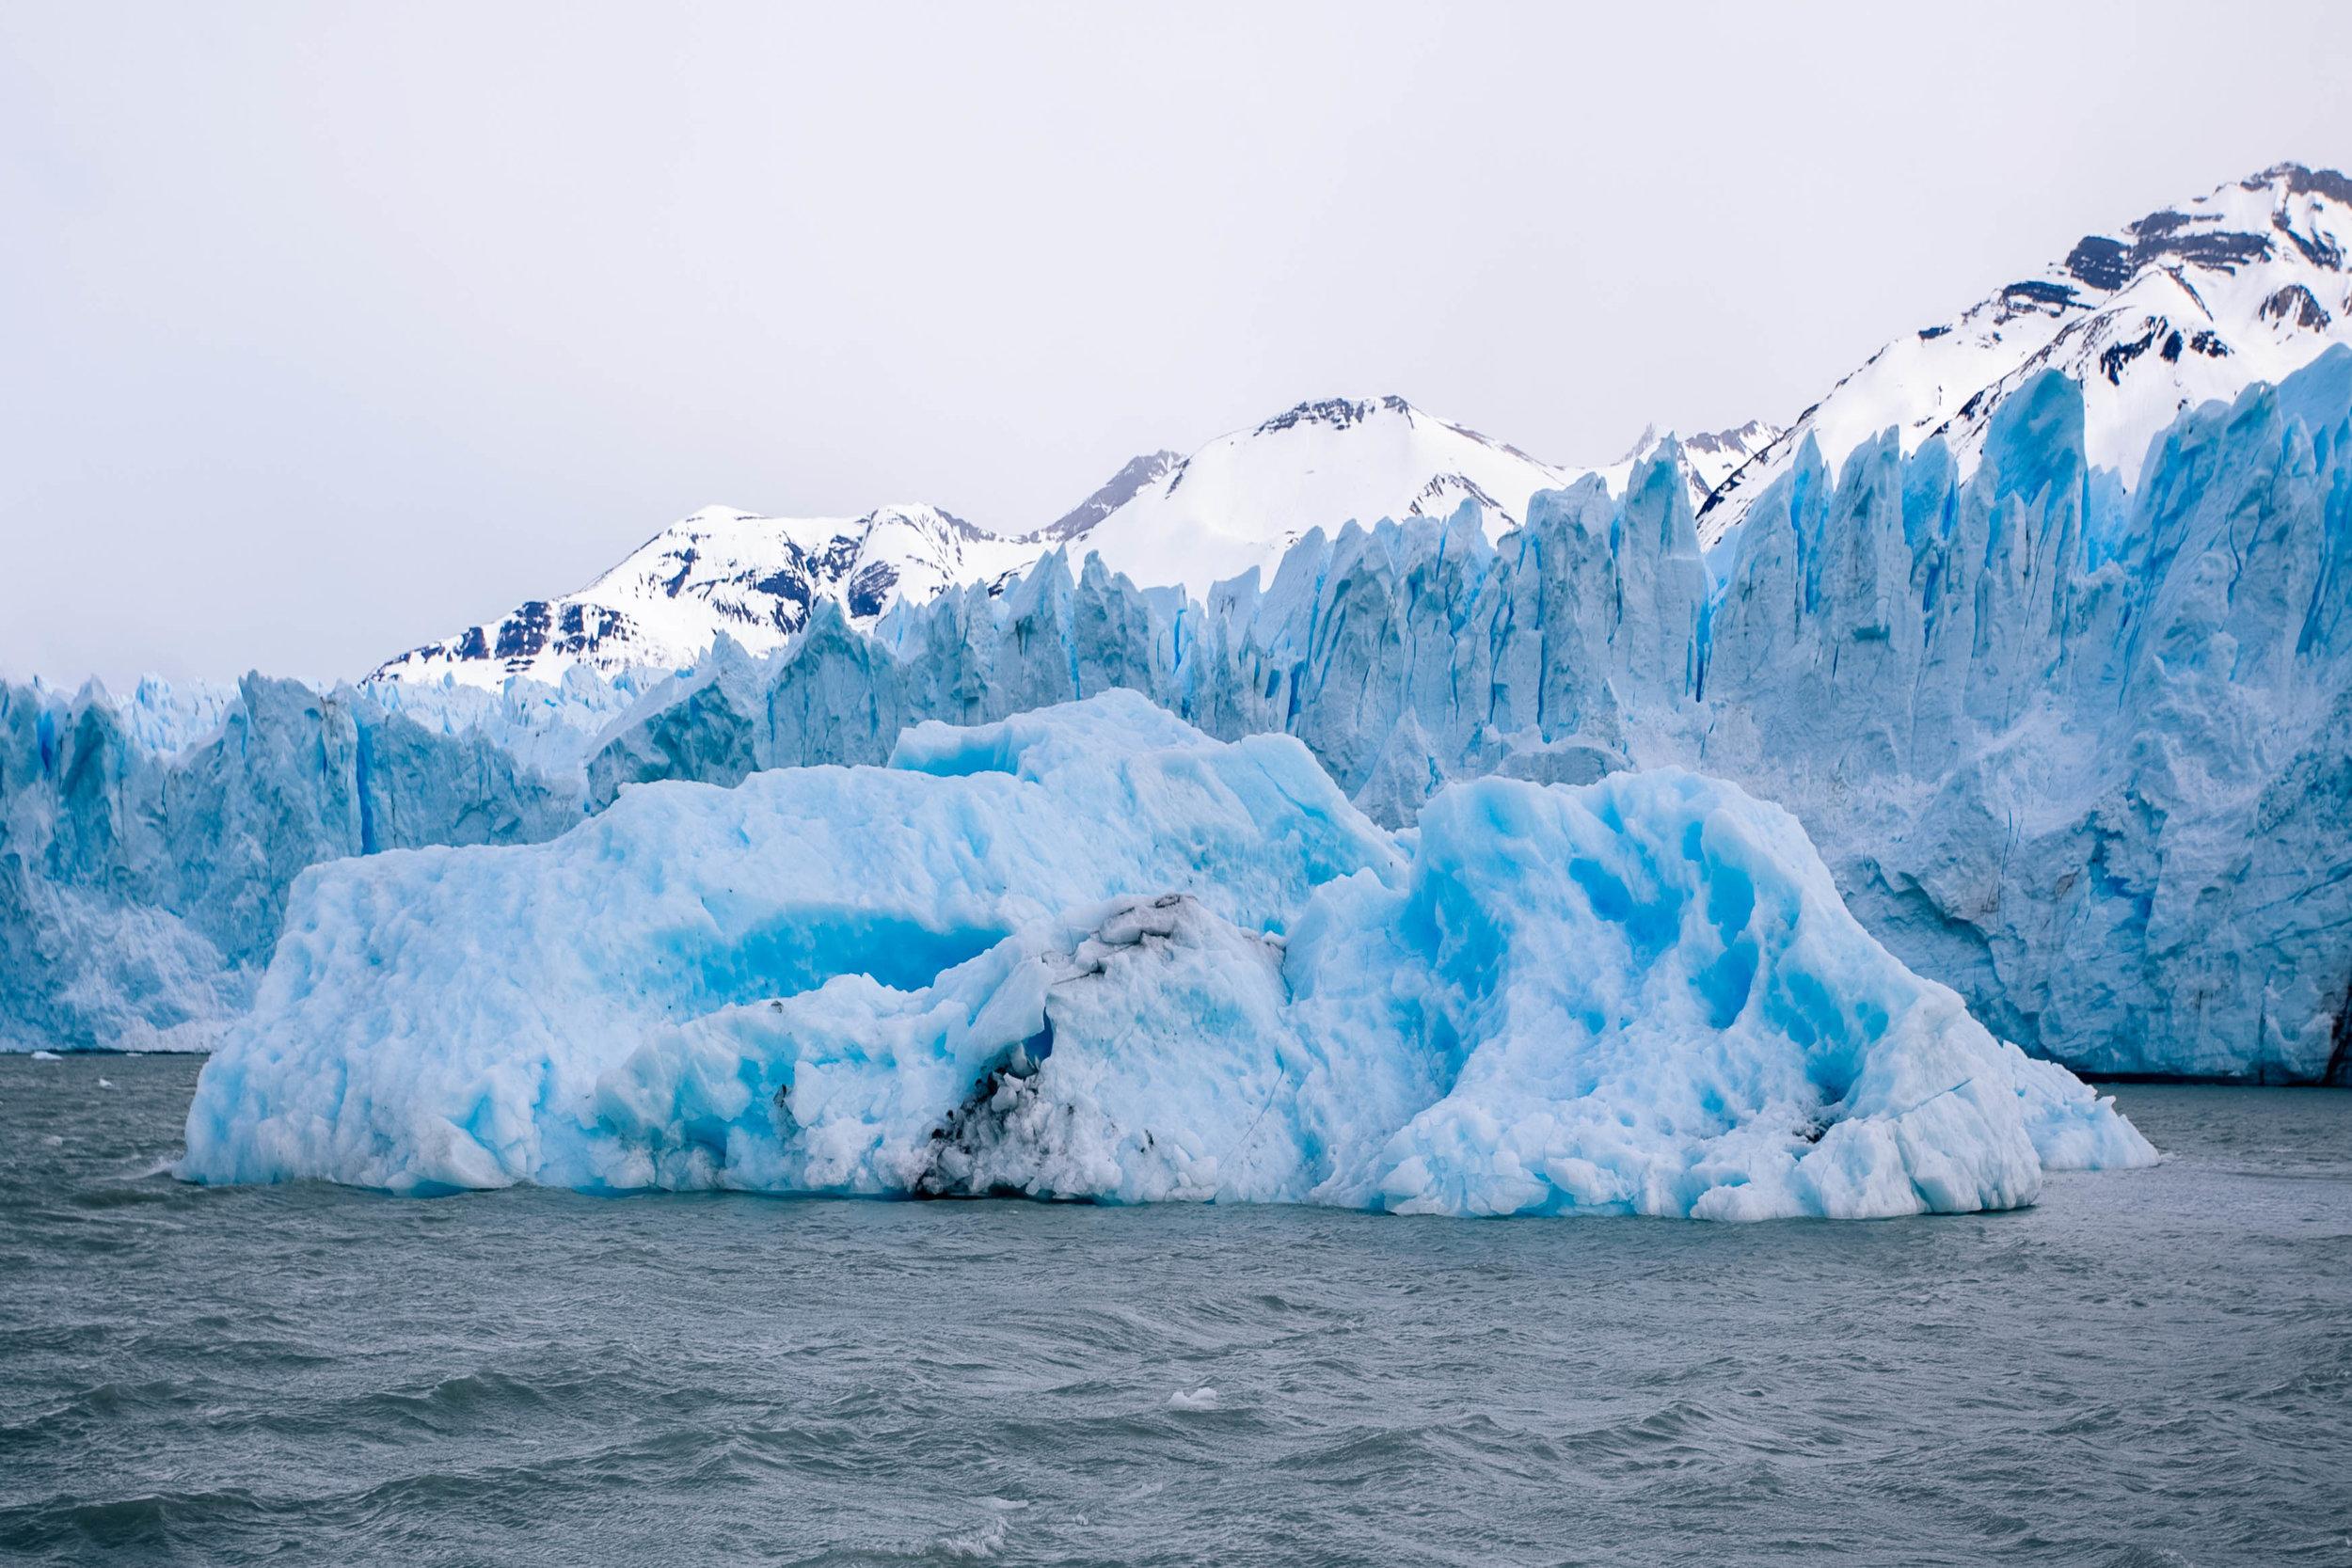 perito moreno patagonia argentina 8.jpg